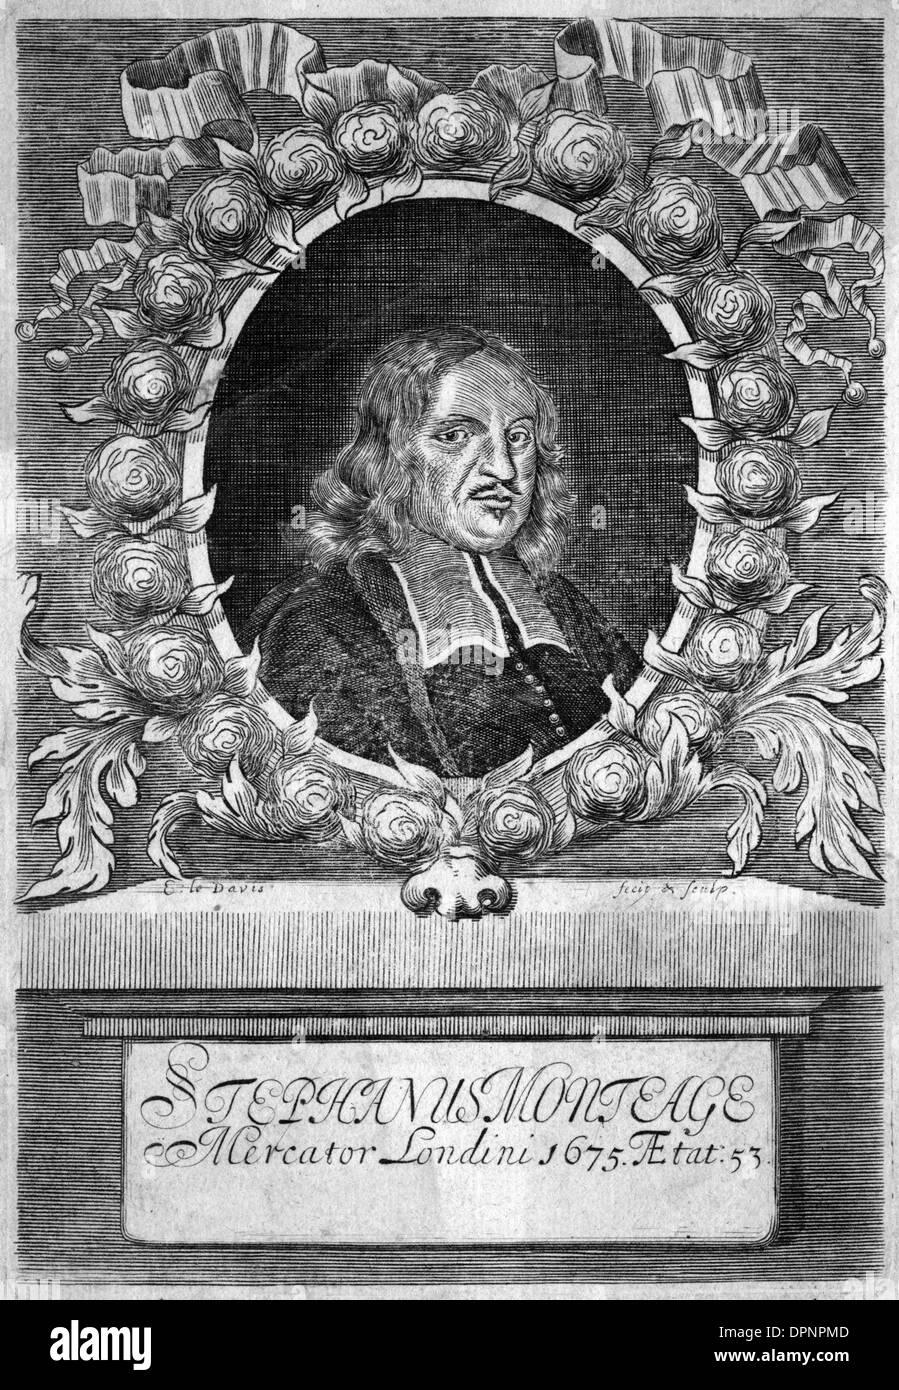 STEPHEN MONTEAGE - Stock Image